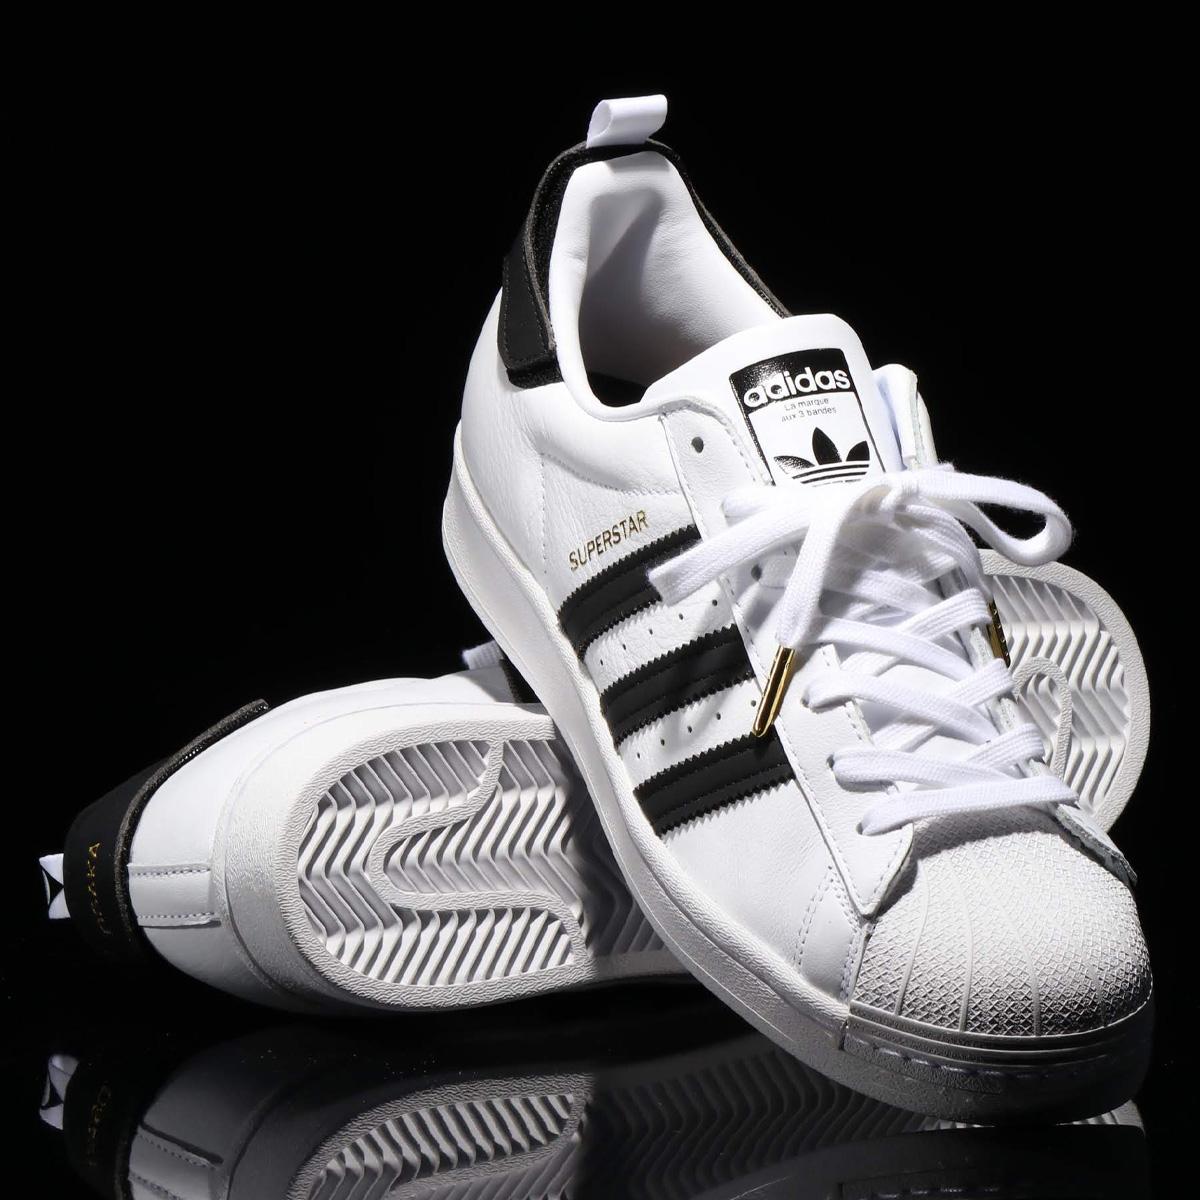 adidas SUPERSTAR(アディダス スーパースター)FOOTWEAR WHITE/CORE BLACK/GOLD METARIC【メンズ レディース スニーカー】20SS-I